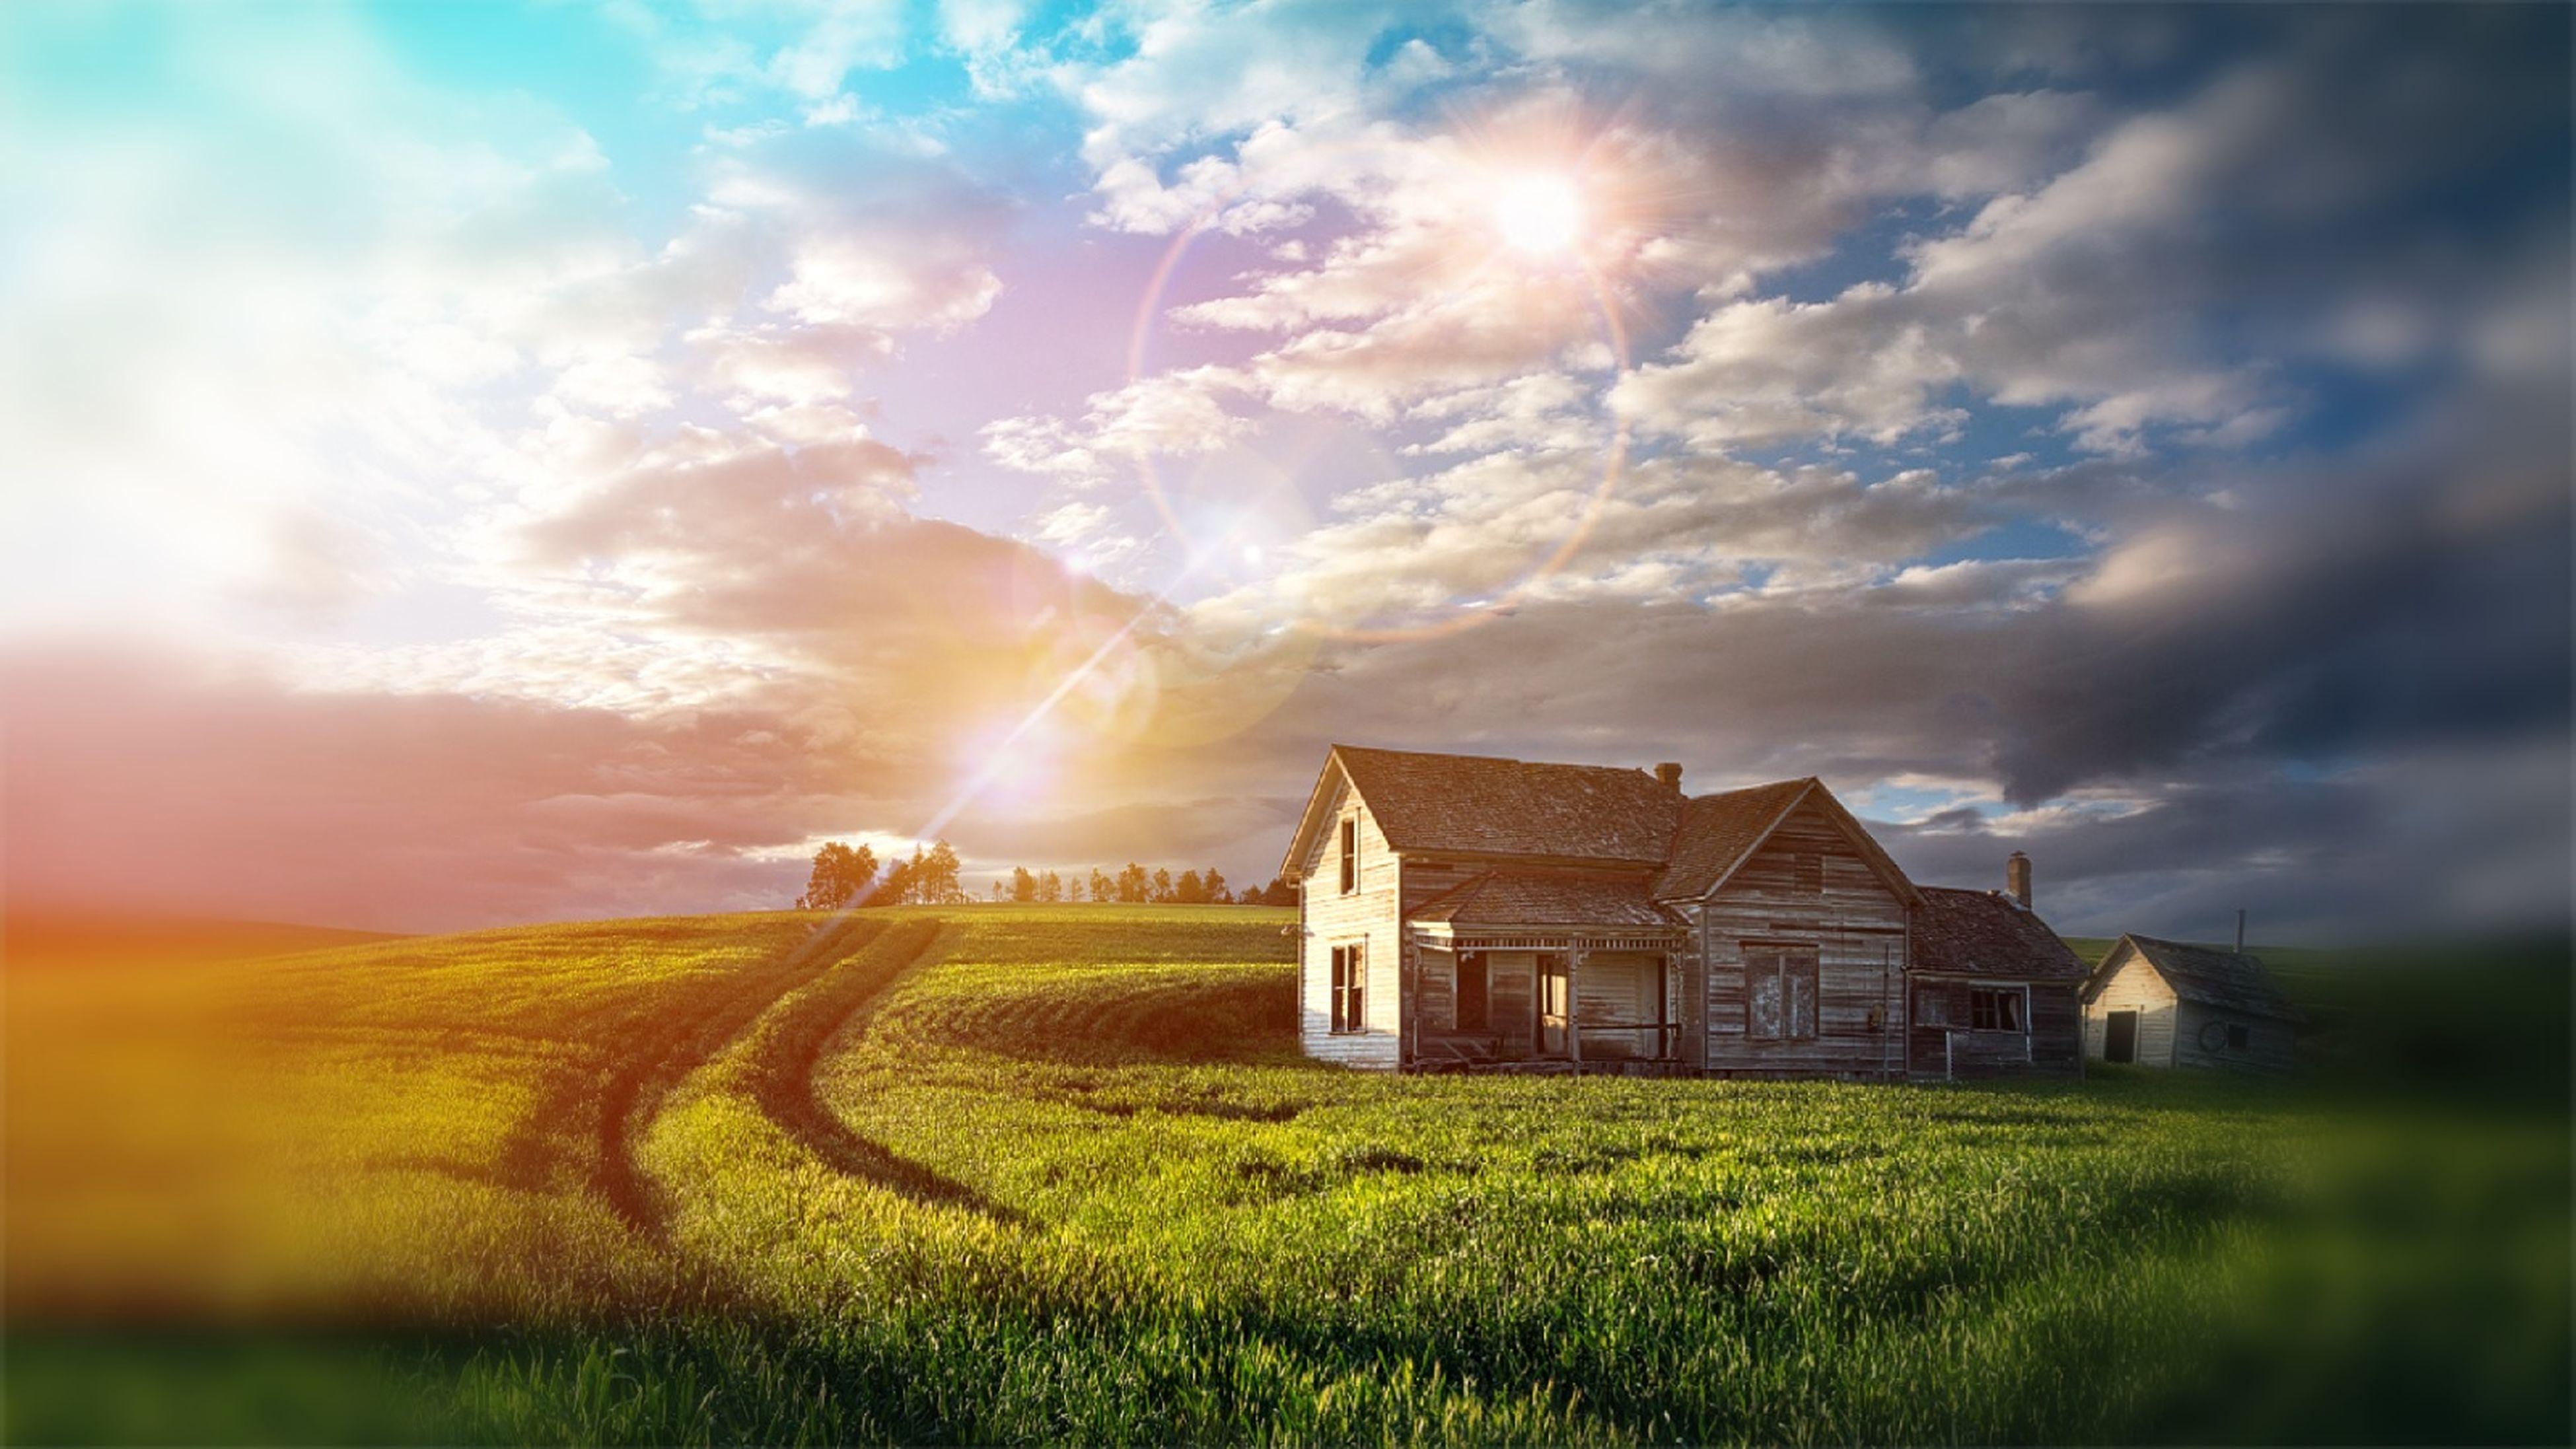 building exterior, field, sky, architecture, built structure, grass, sunbeam, landscape, sun, rural scene, sunset, cloud - sky, house, farm, sunlight, lens flare, nature, tranquil scene, agriculture, beauty in nature